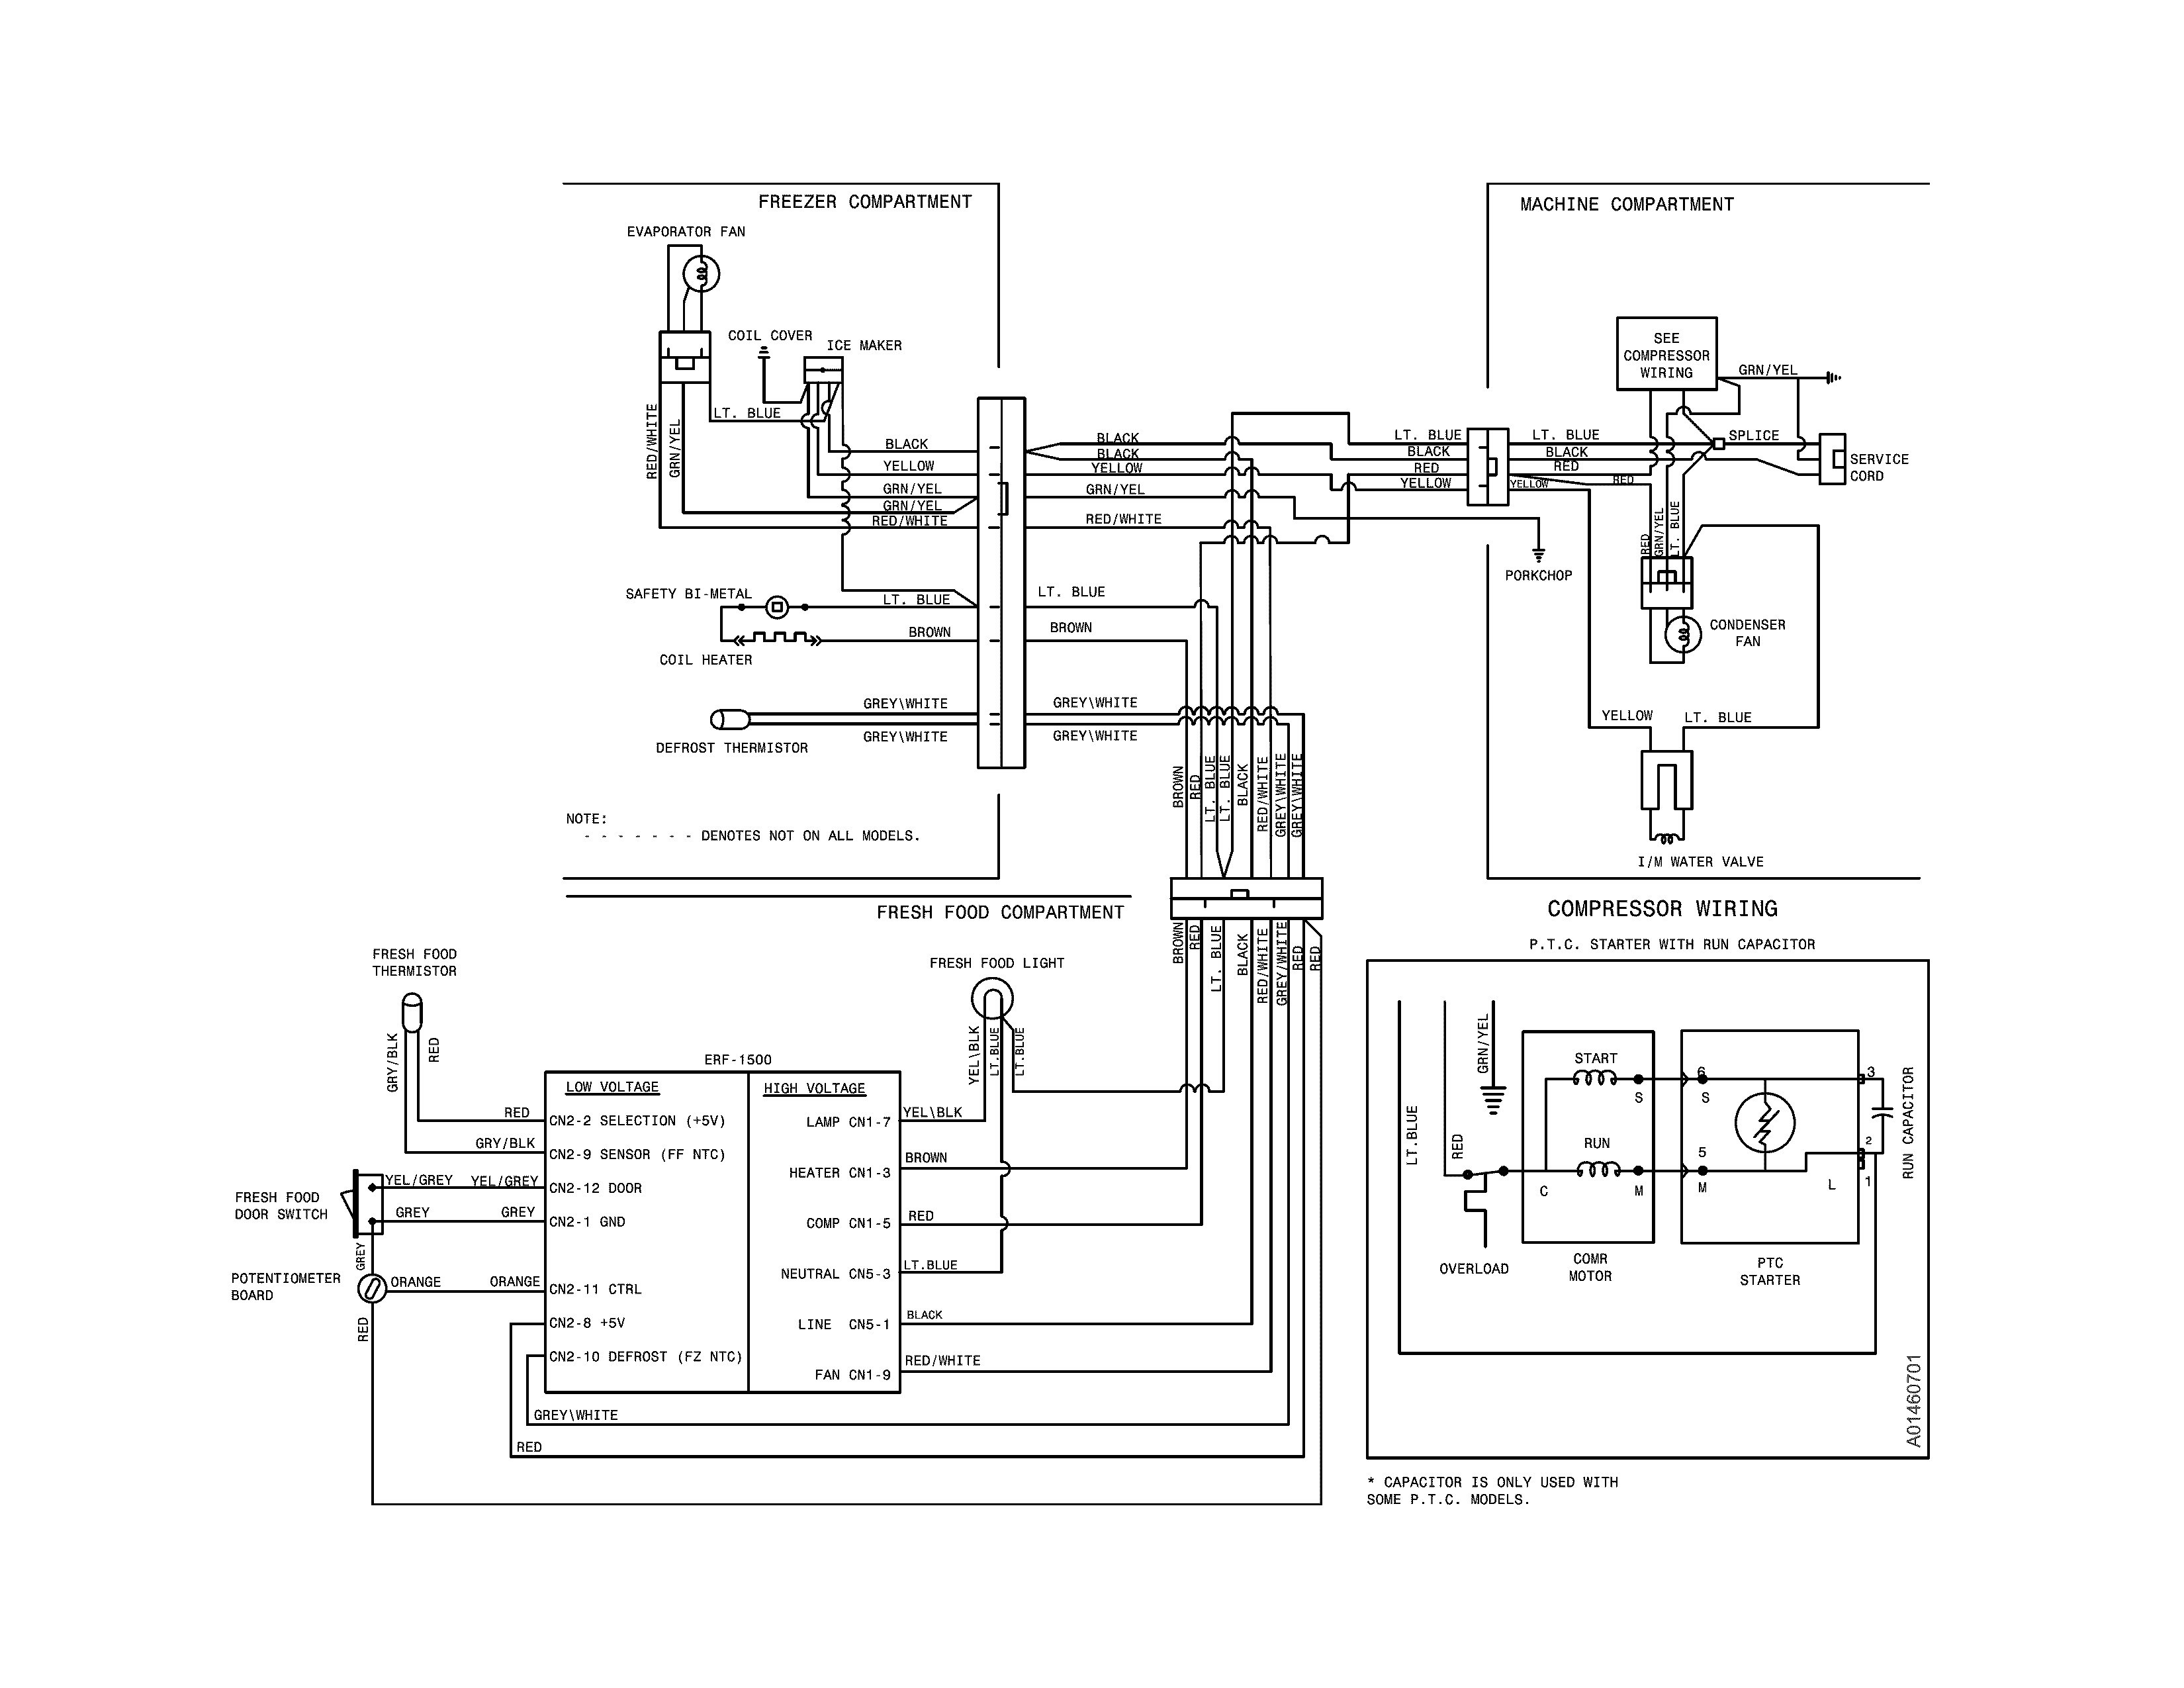 True Refrigerator Compressor Wiring Diagram | Wiring Diagram - Refrigerator Compressor Wiring Diagram